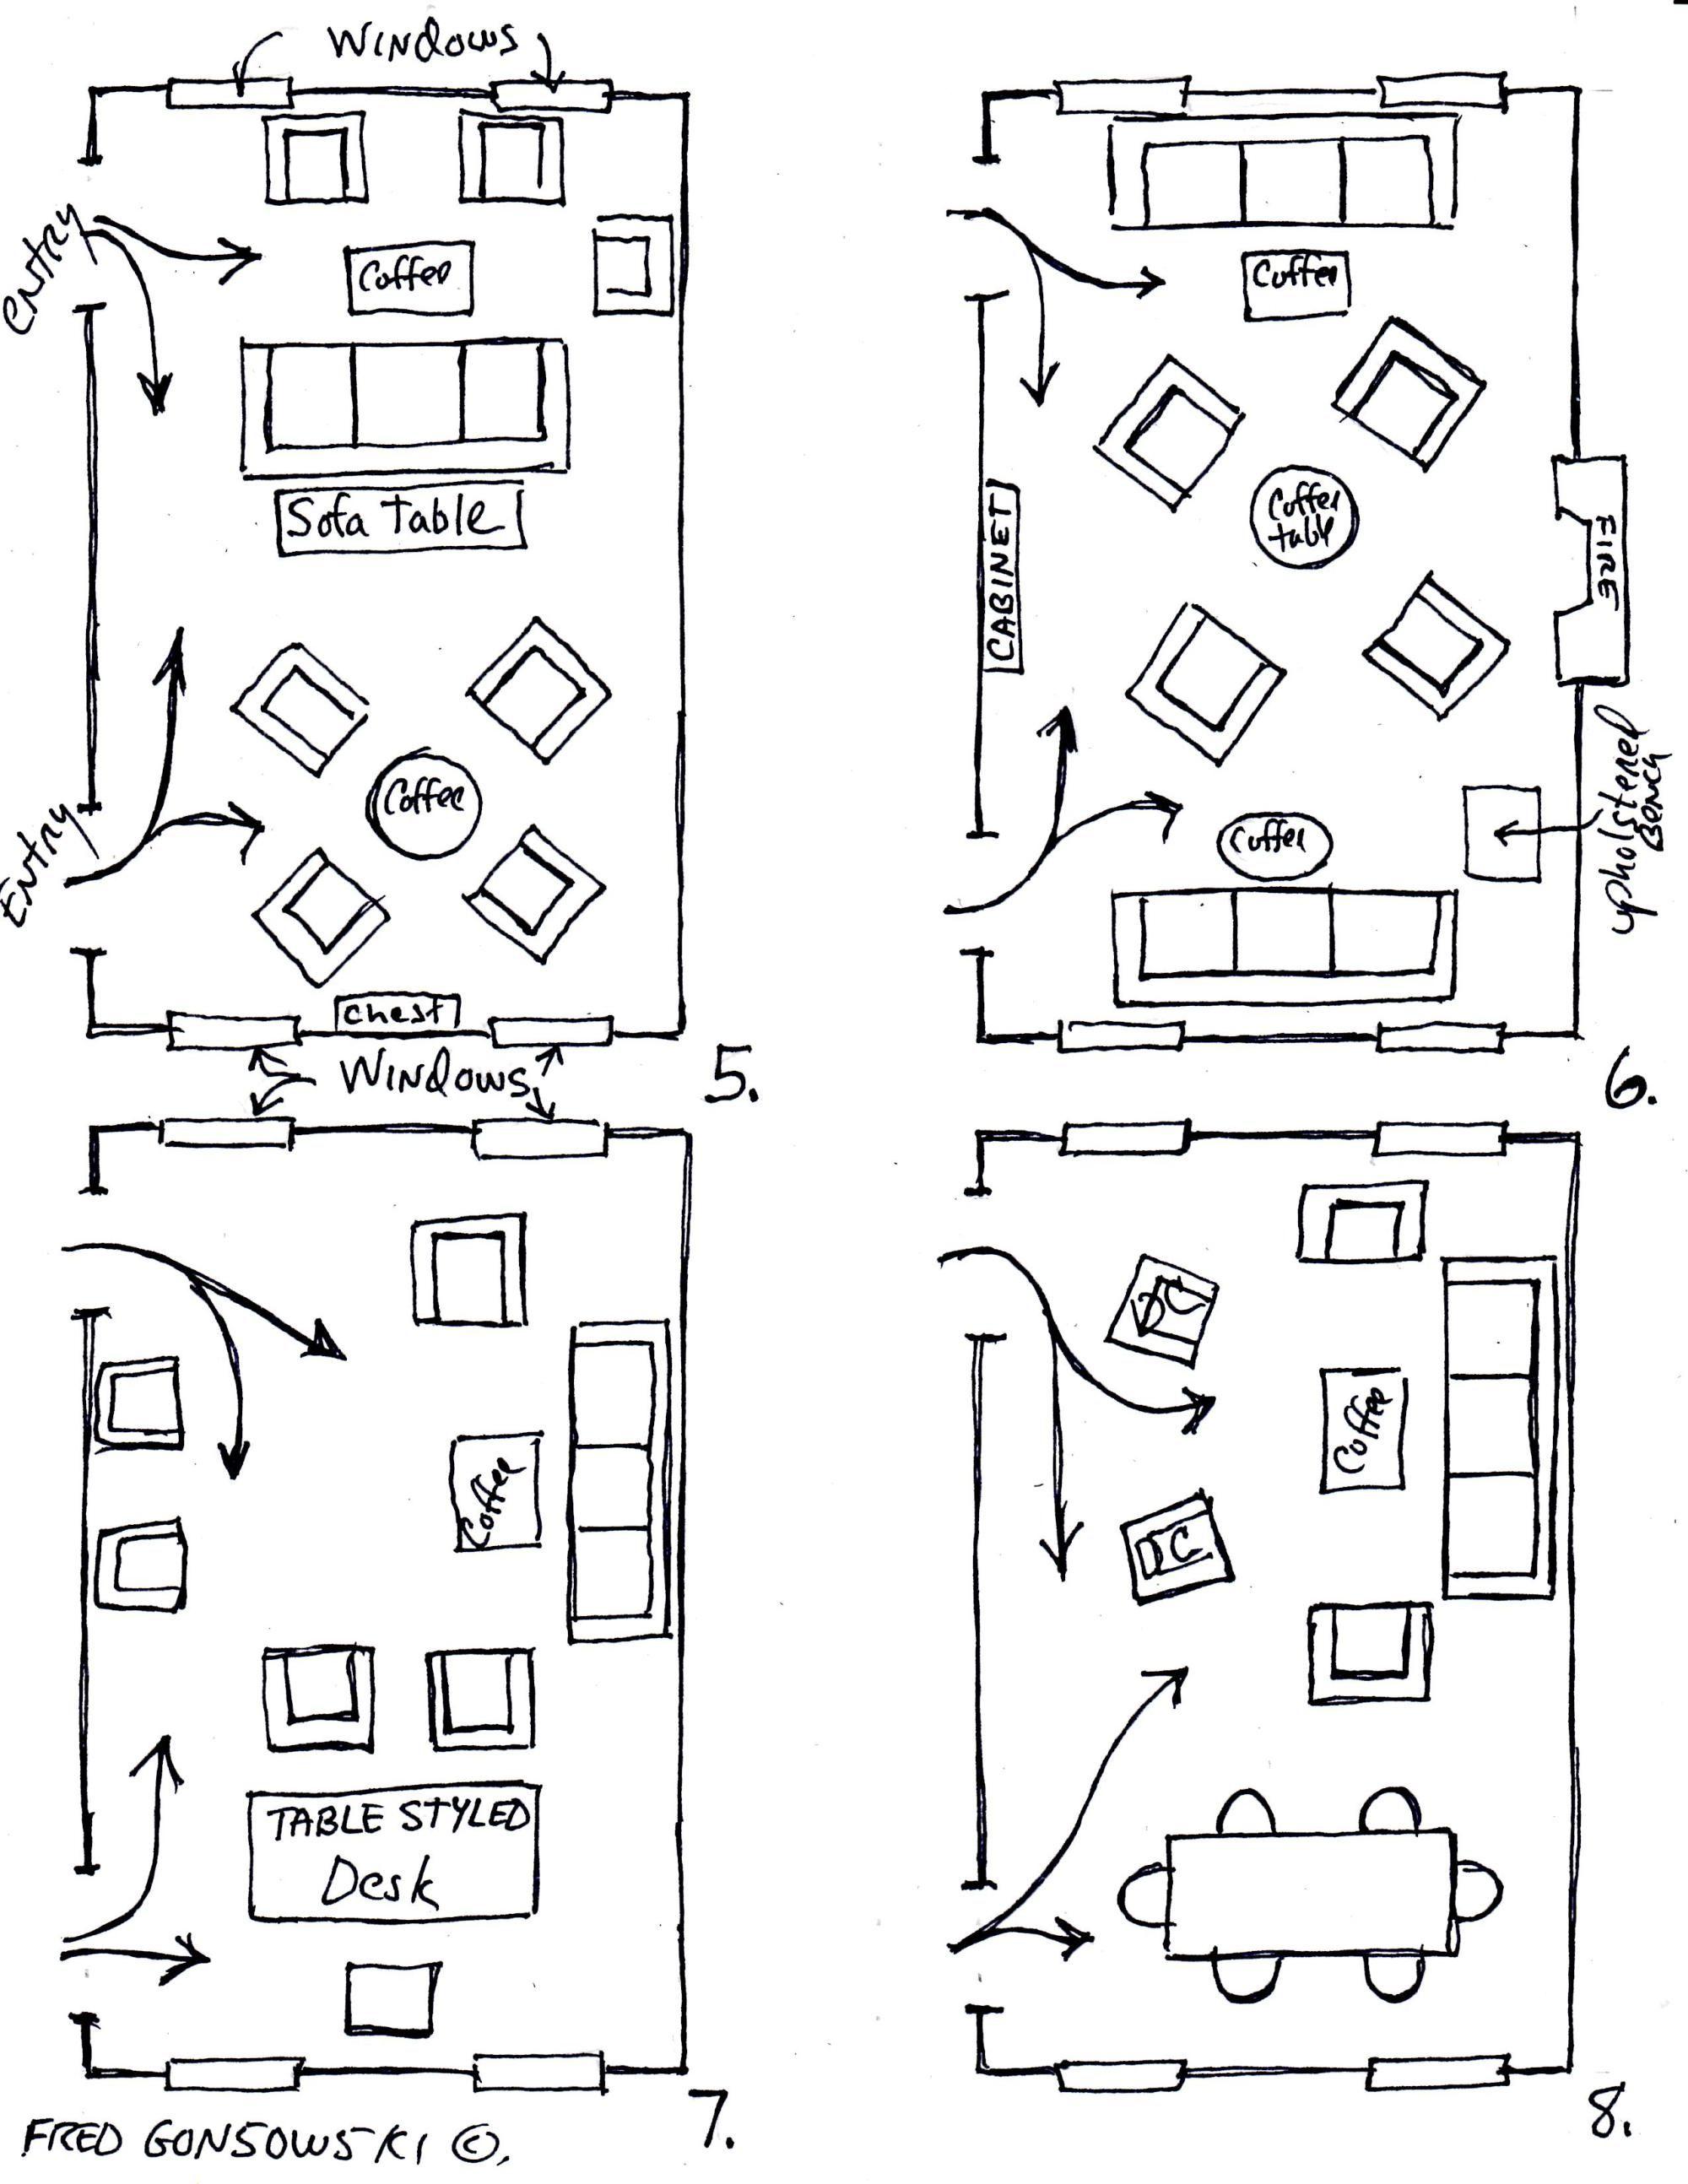 Arranging Furniture Twelve Different Ways In The Same Room